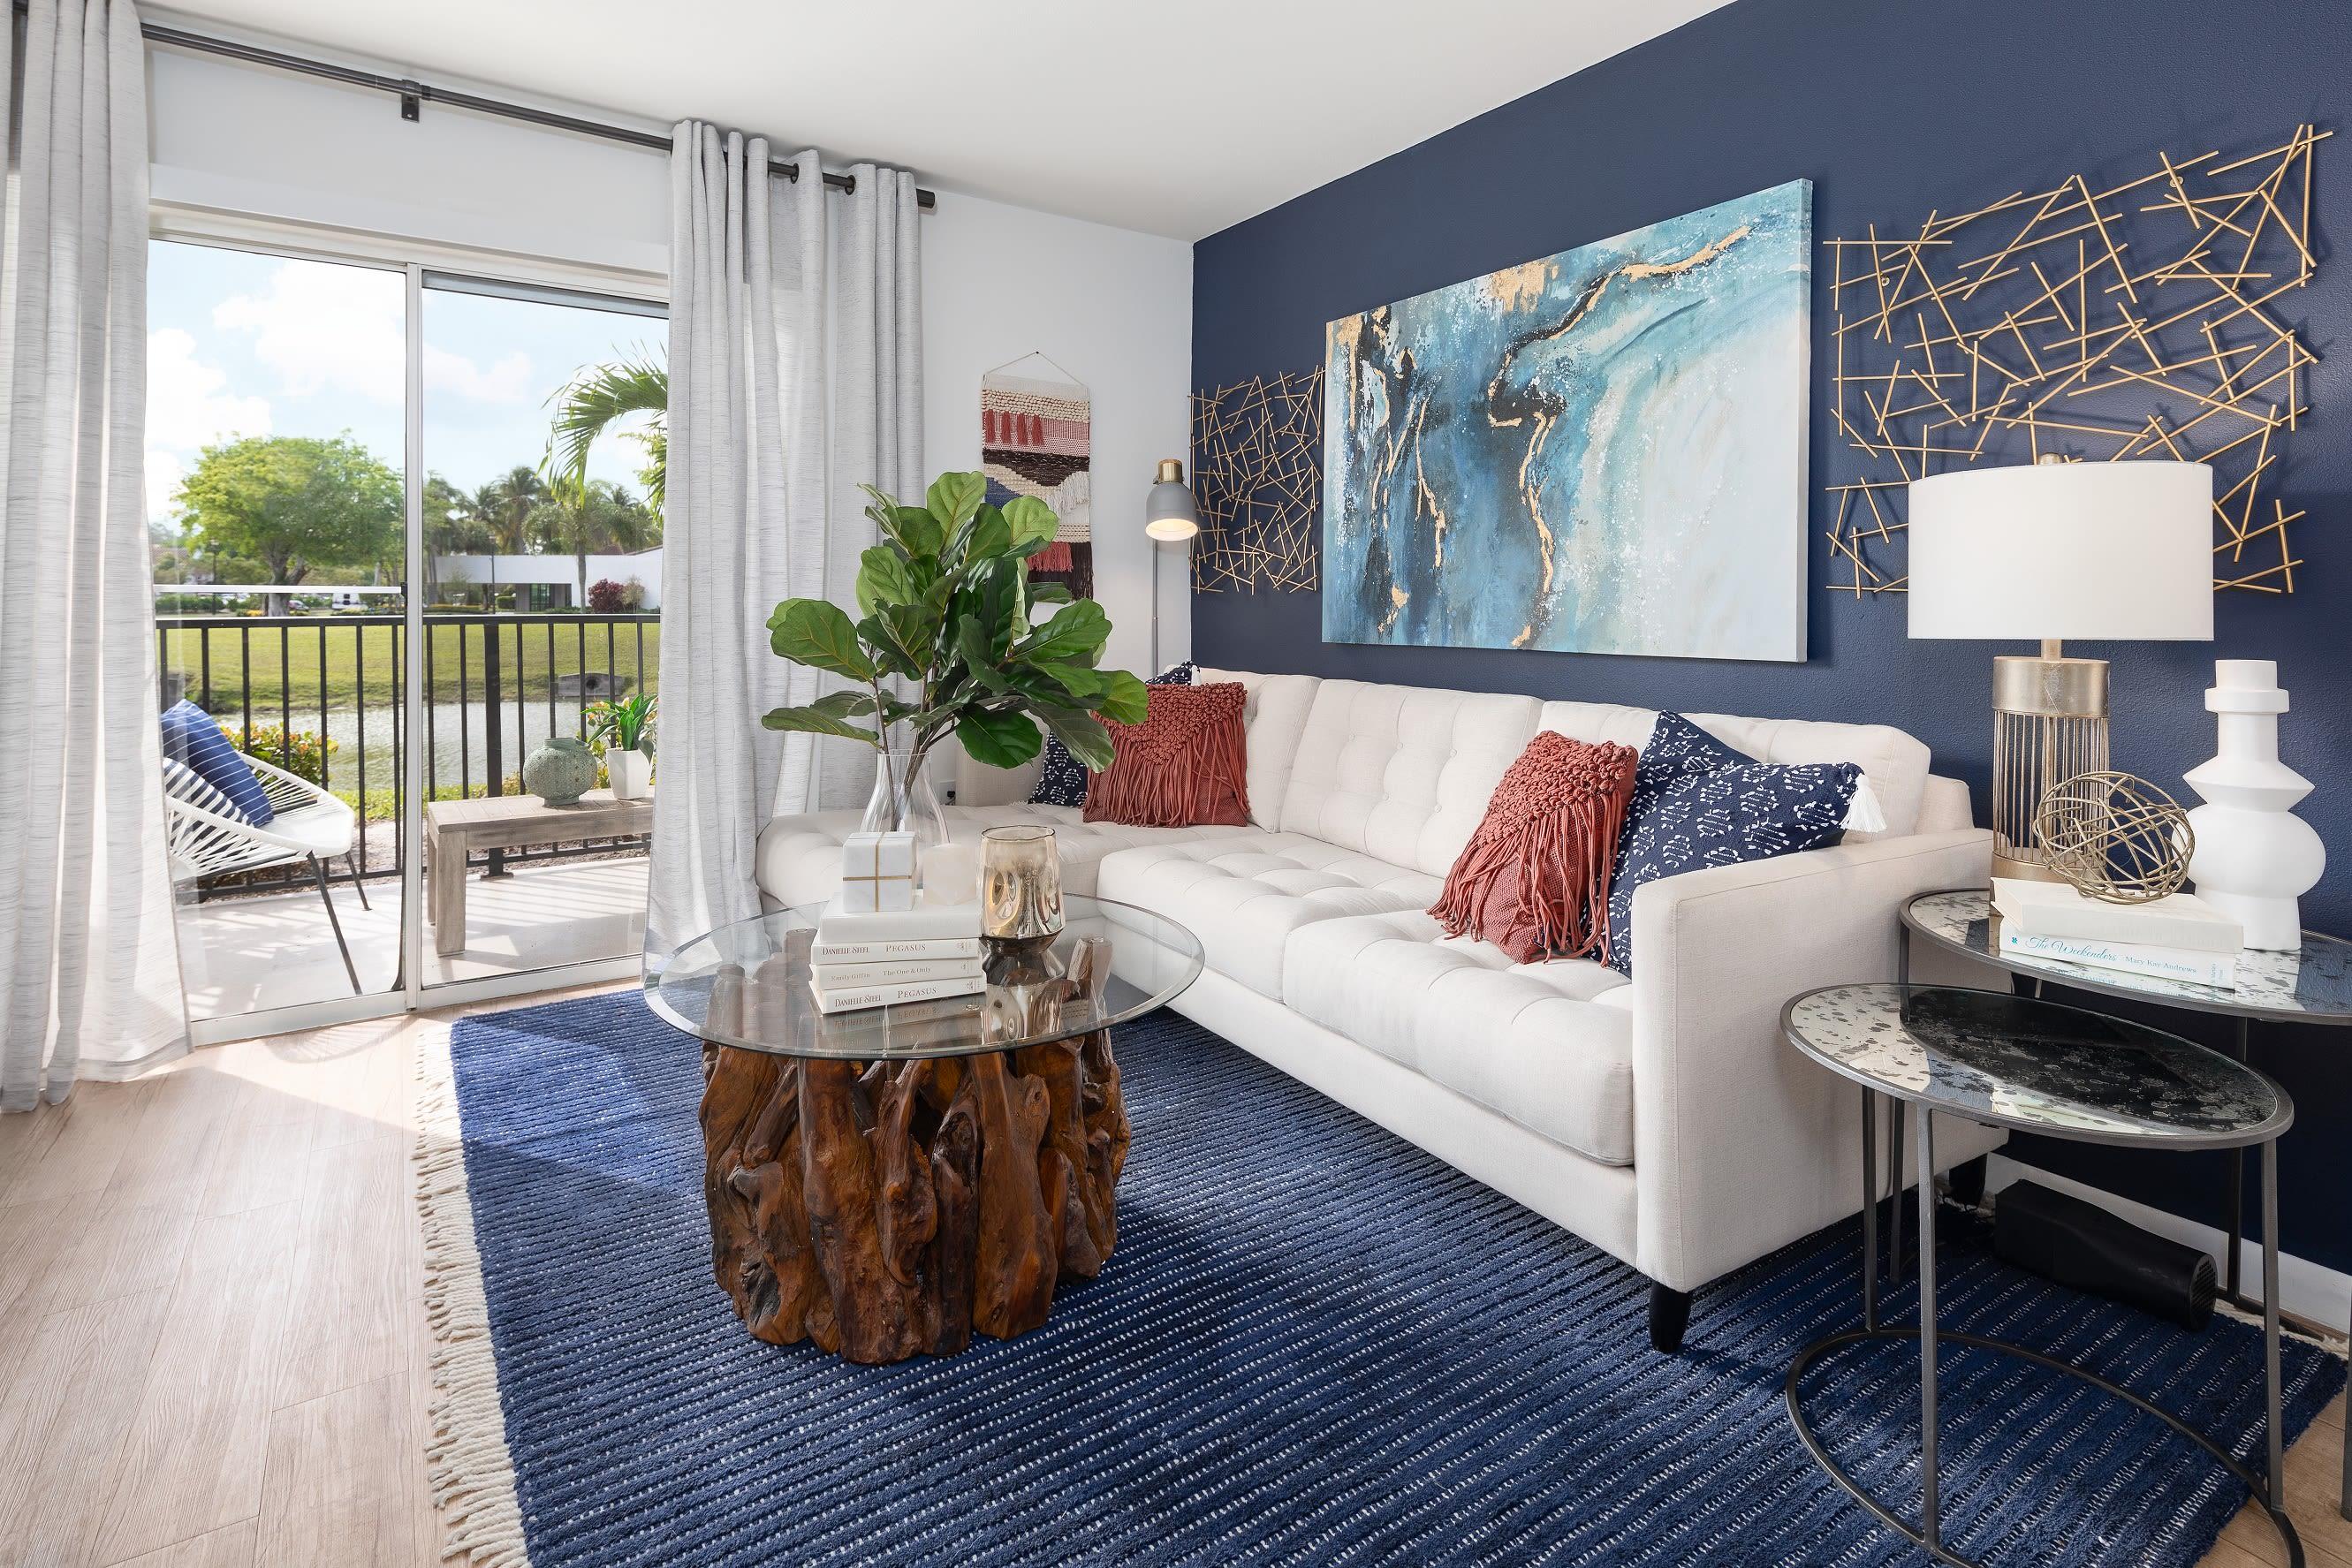 Living room with patio access at Cielo Boca in Boca Raton, Florida